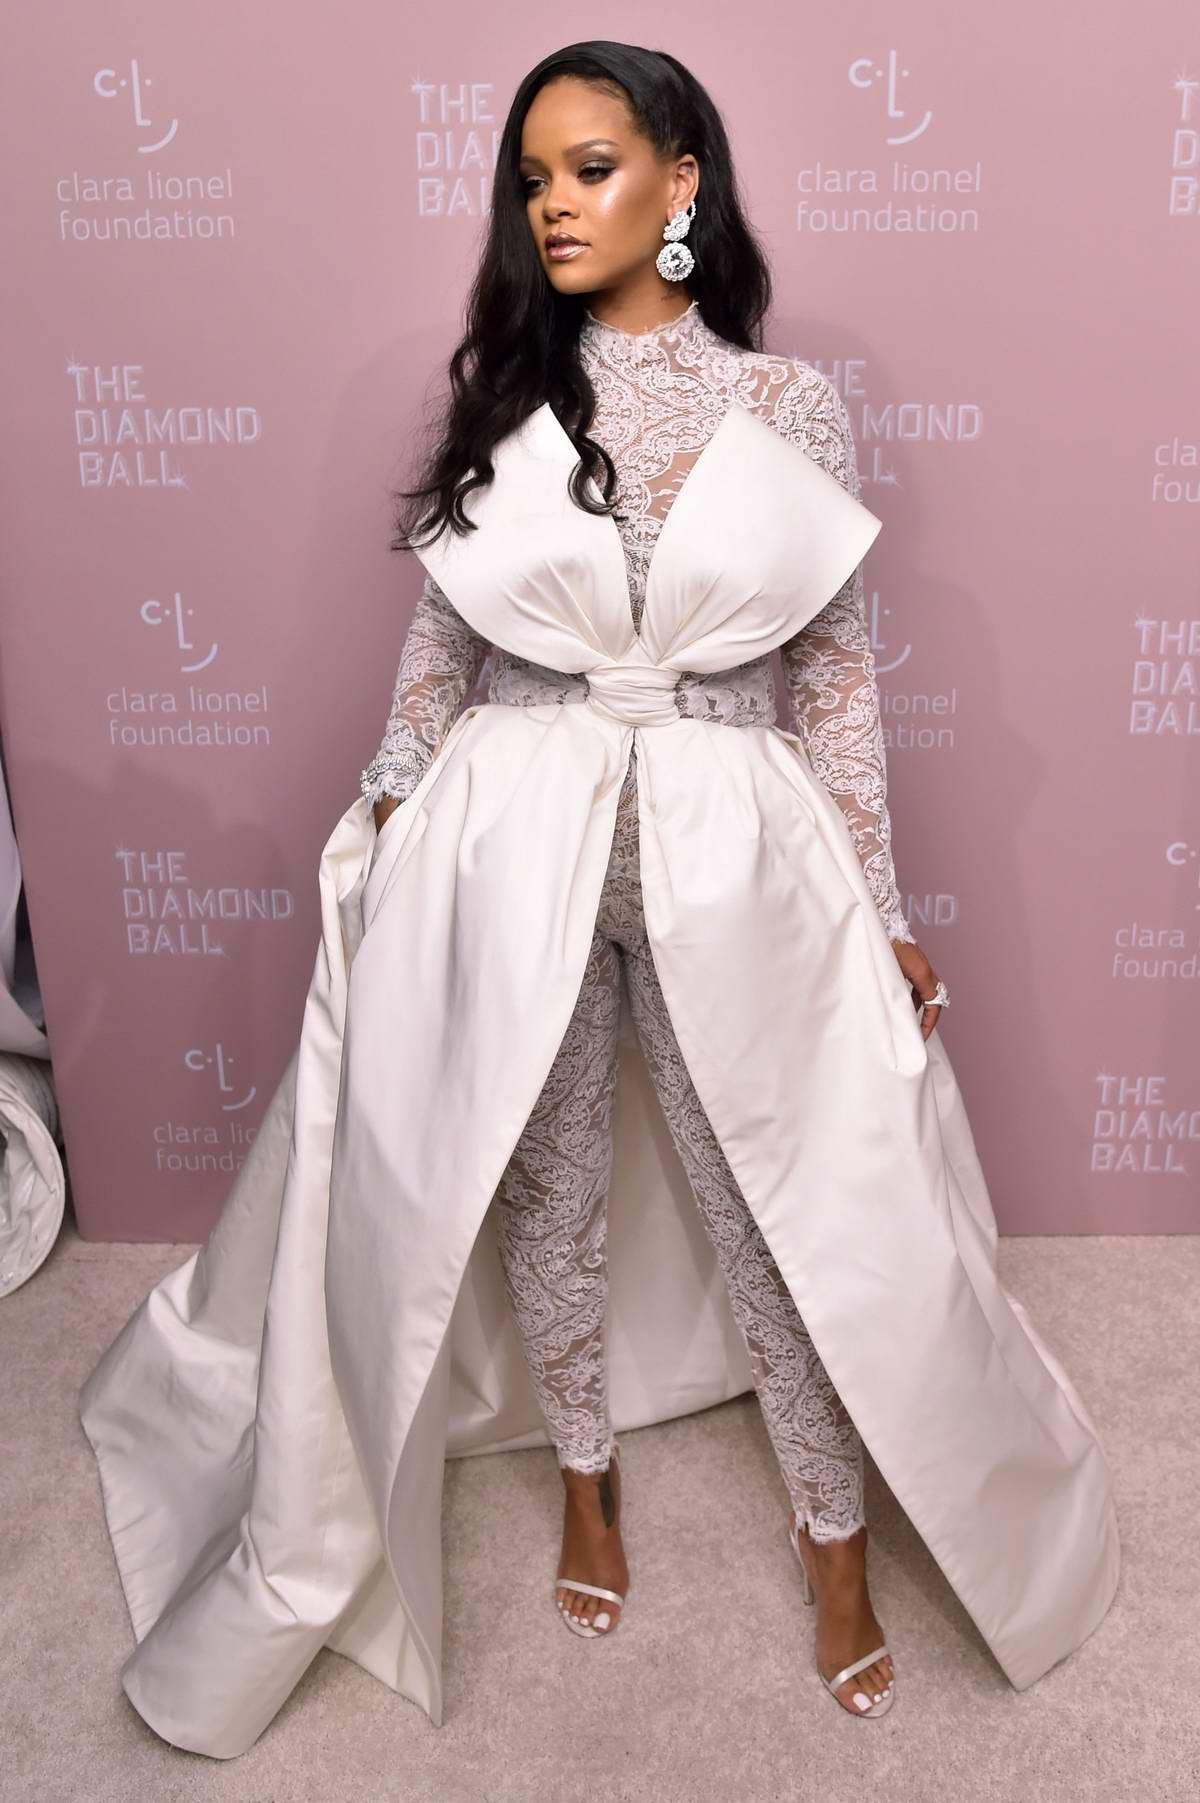 Rihanna attends 4th Annual Clara Lionel Foundation Diamond Ball in New York City